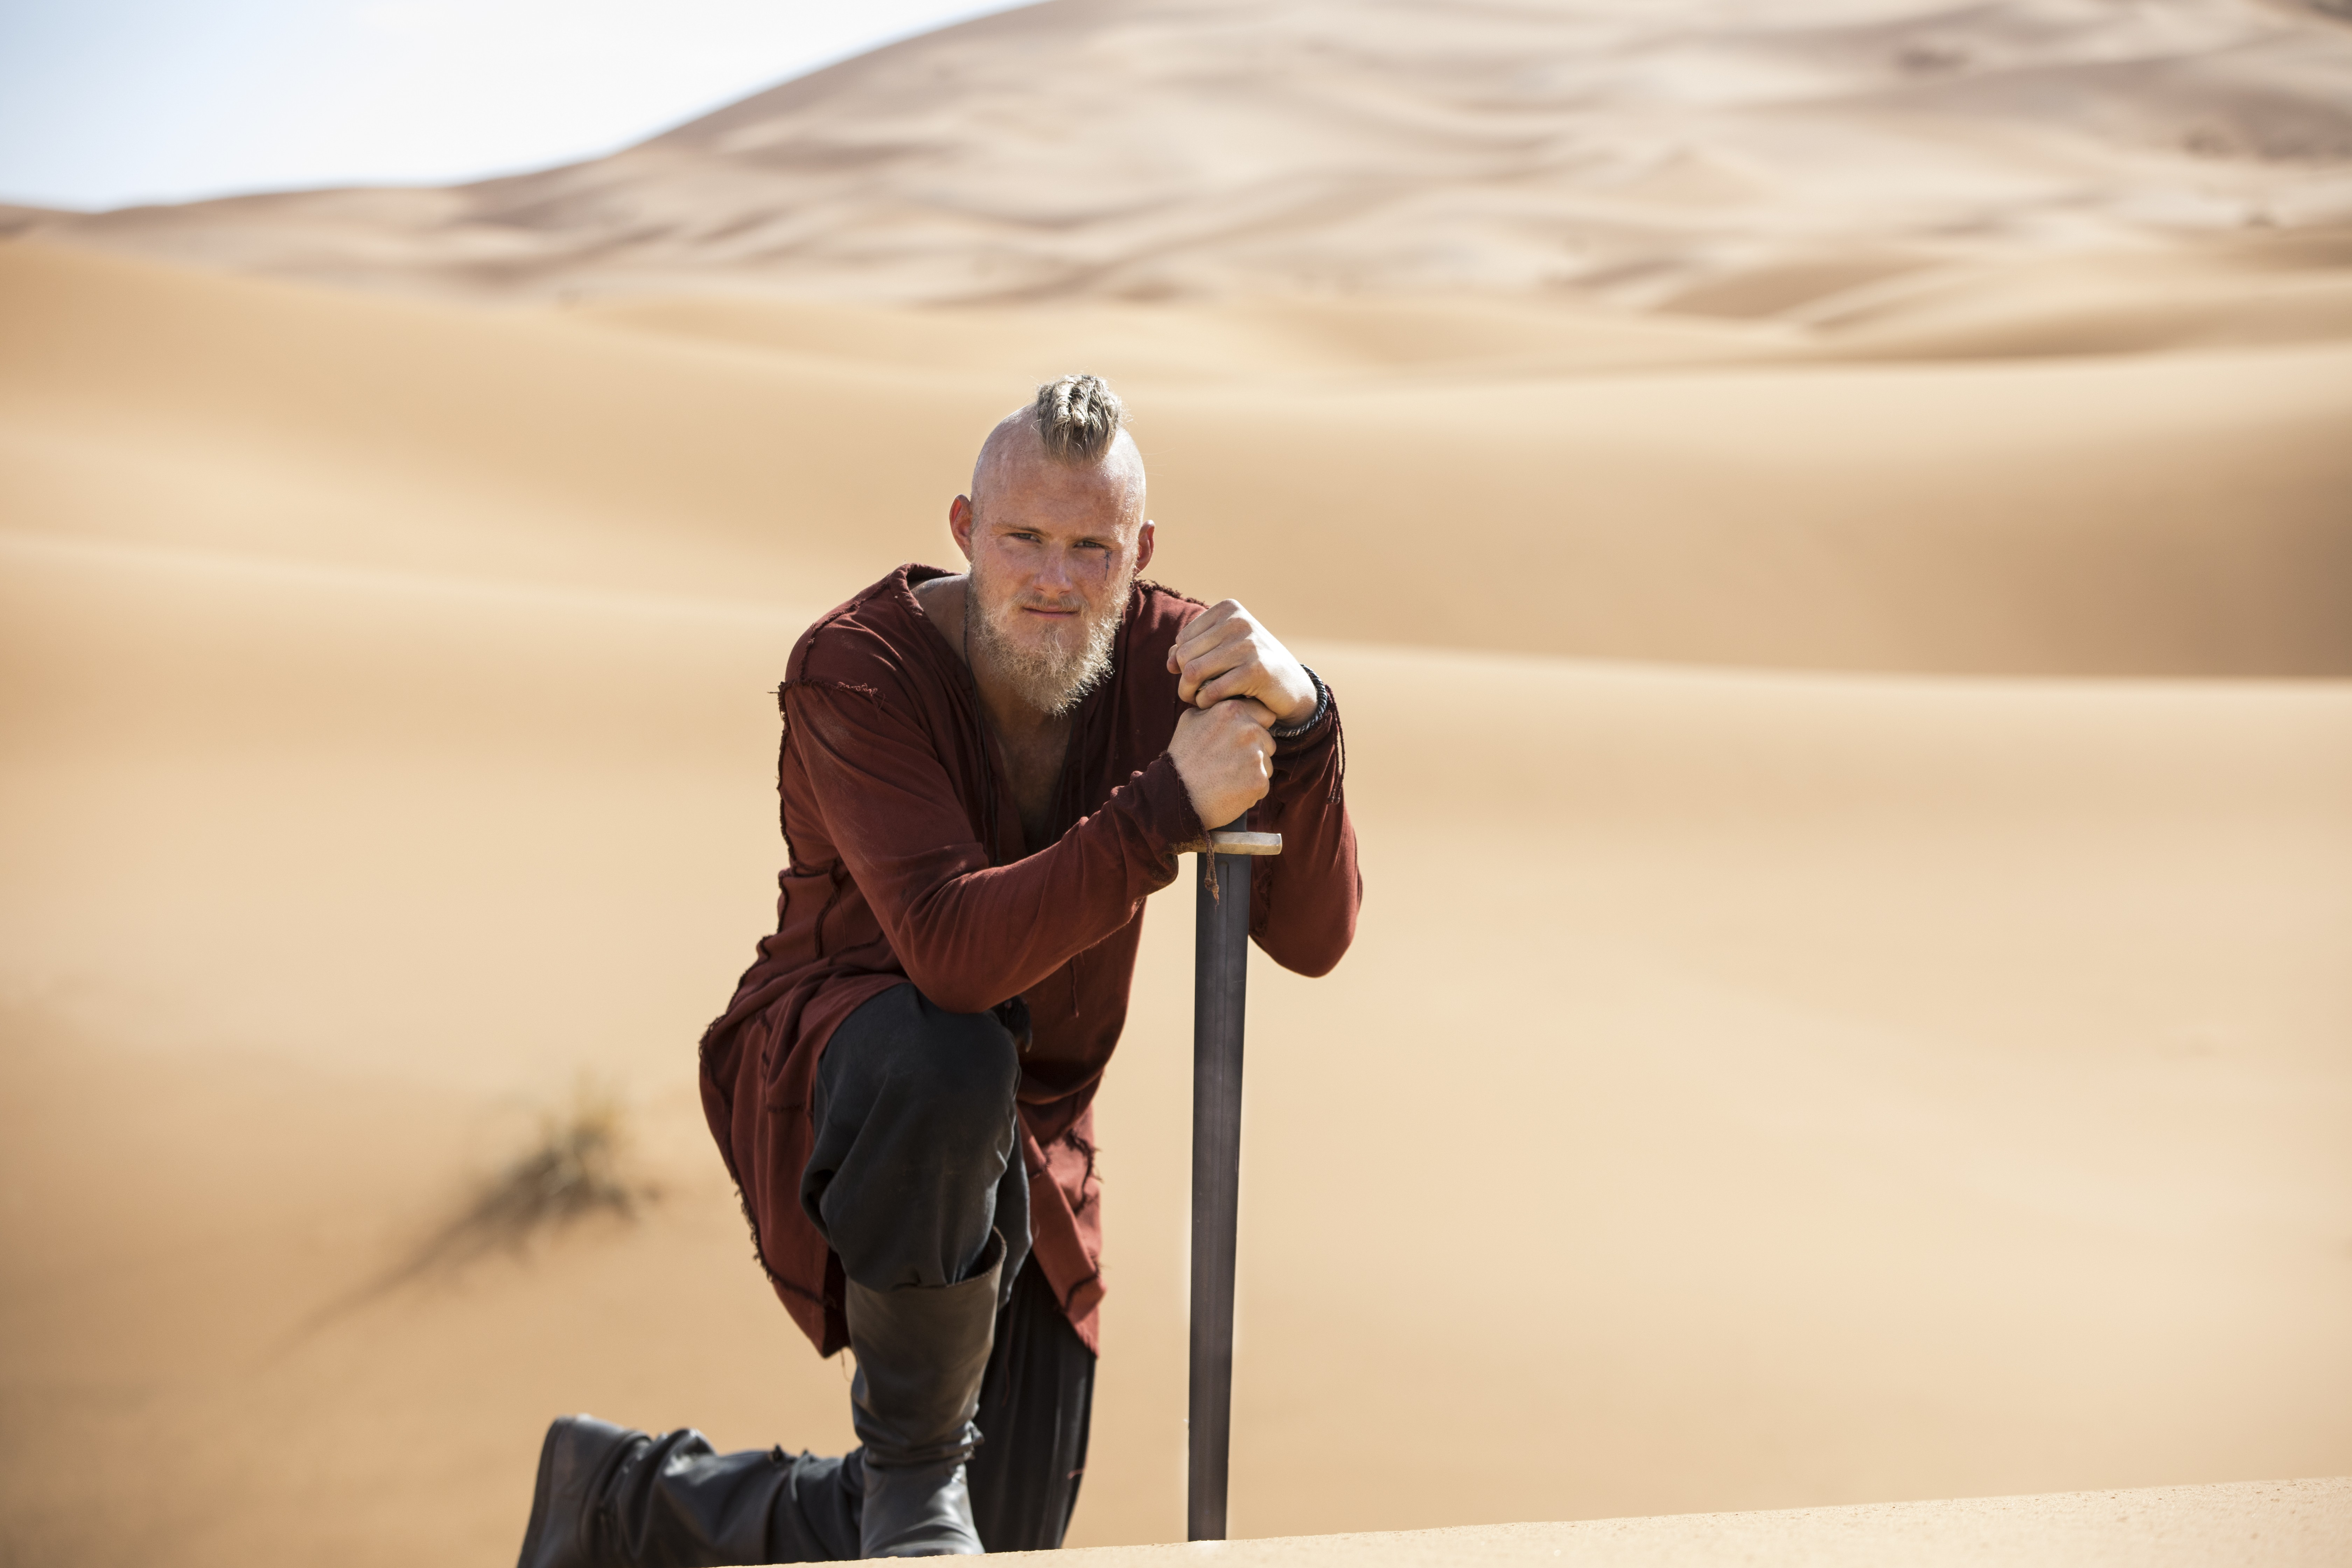 Bjorn Ironside Jarnsida Ragnarsson Ragnar Lothbrok's Son Vikings